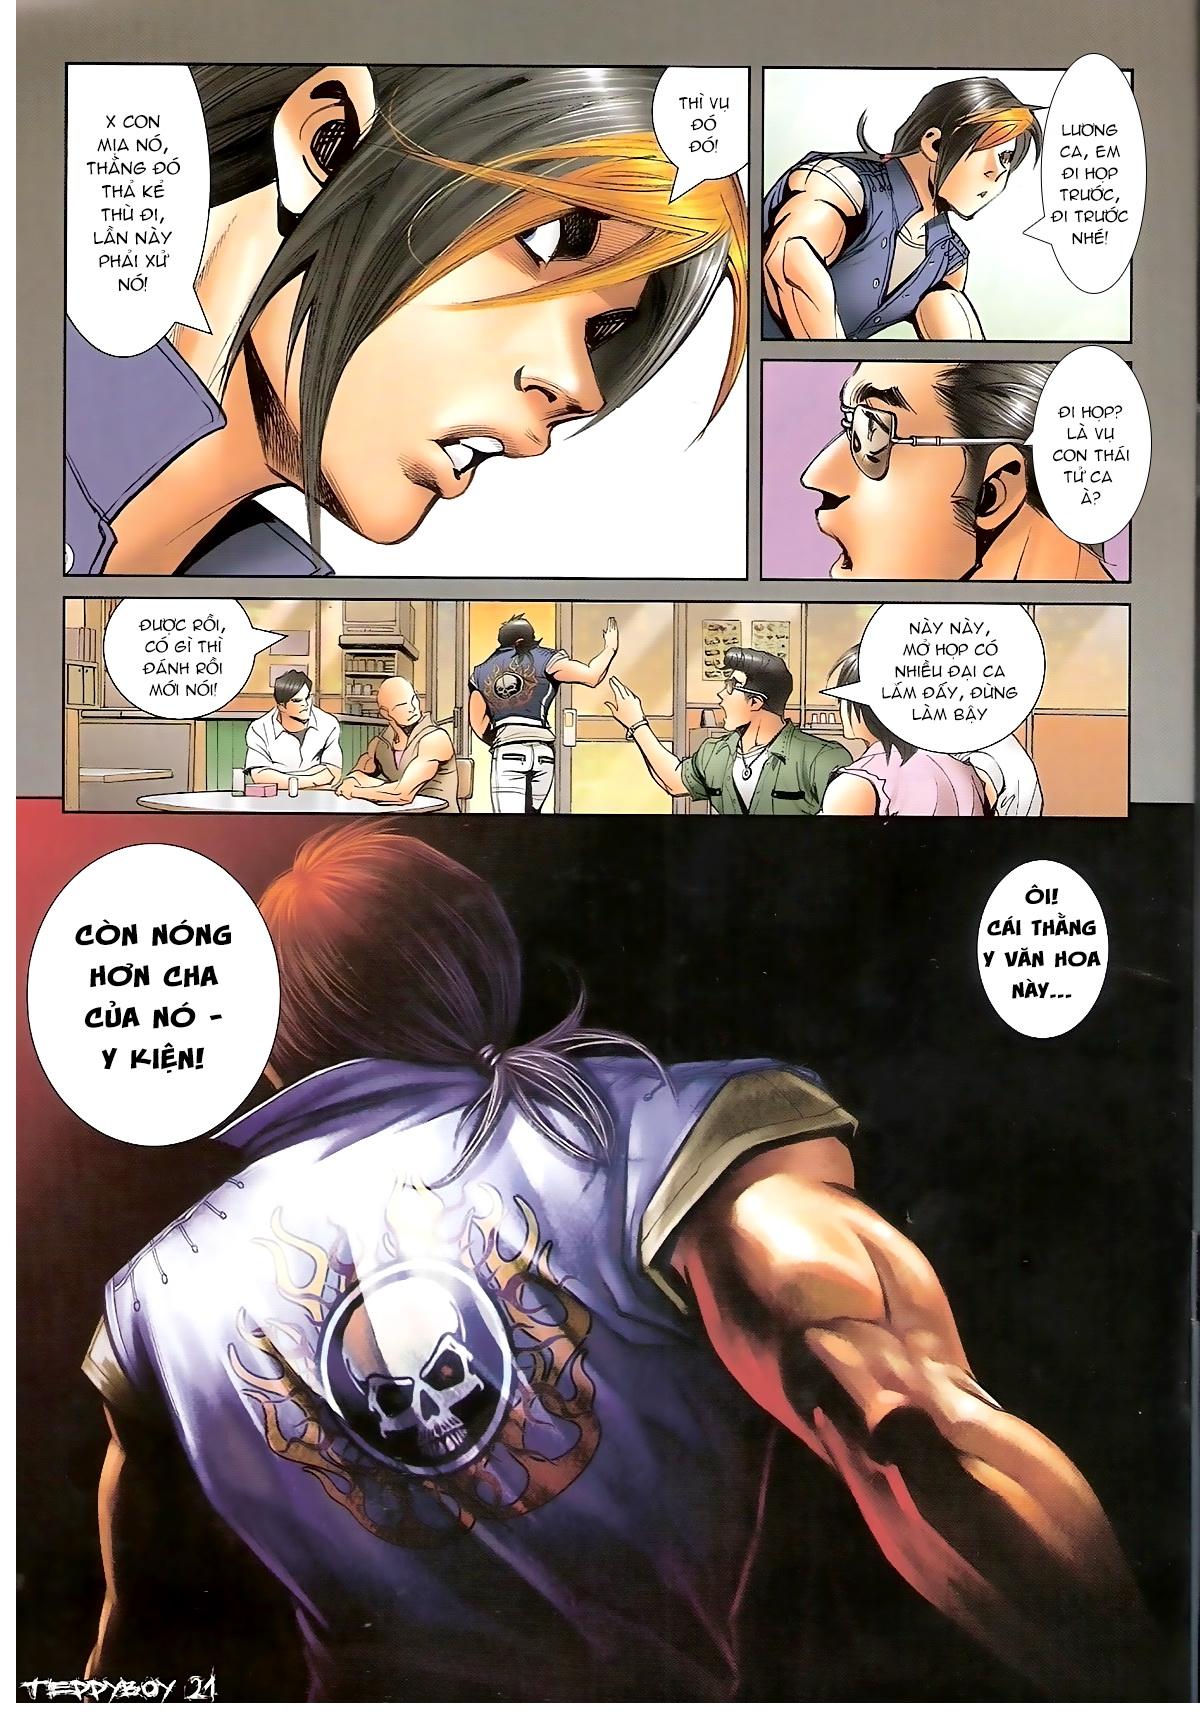 Người Trong Giang Hồ - Chapter 1320: Con trai Y Kiện - Pic 17